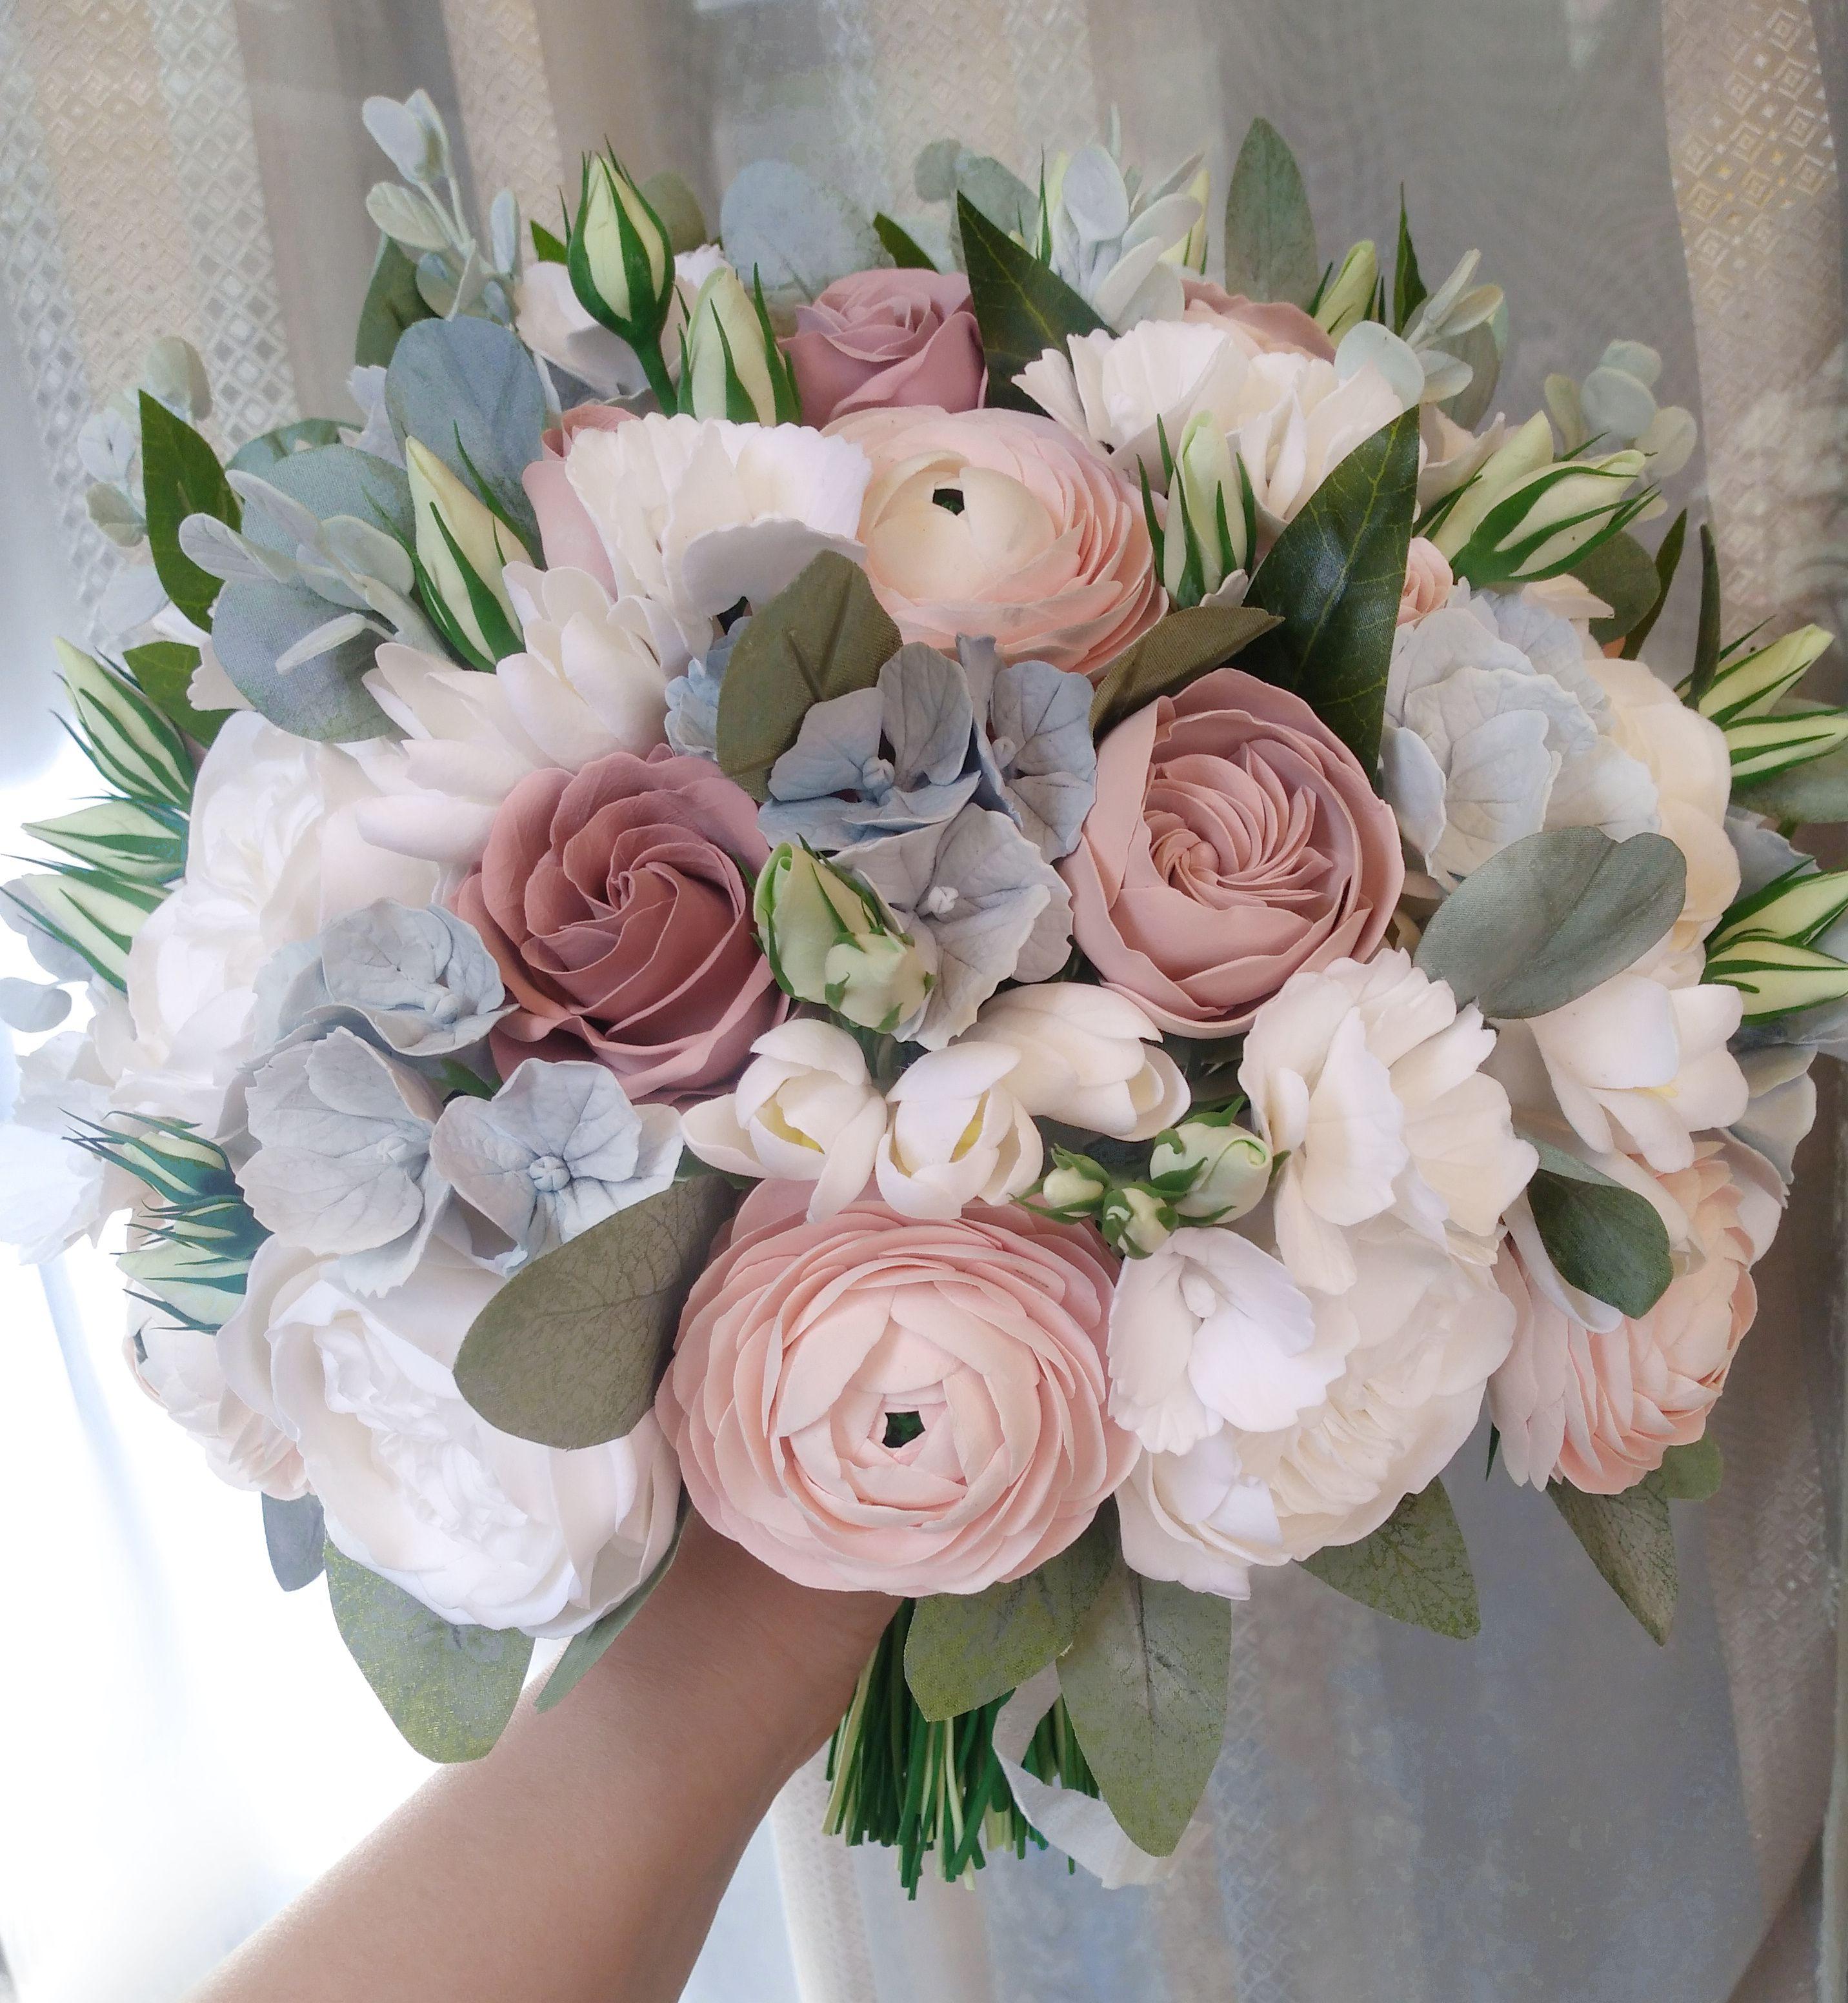 Dusty Rose Wedding Bouquet Soft Pink Ranunculus Peony Etsy Flower Bouquet Wedding Dusty Rose Wedding Garden Rose Bouquet Wedding